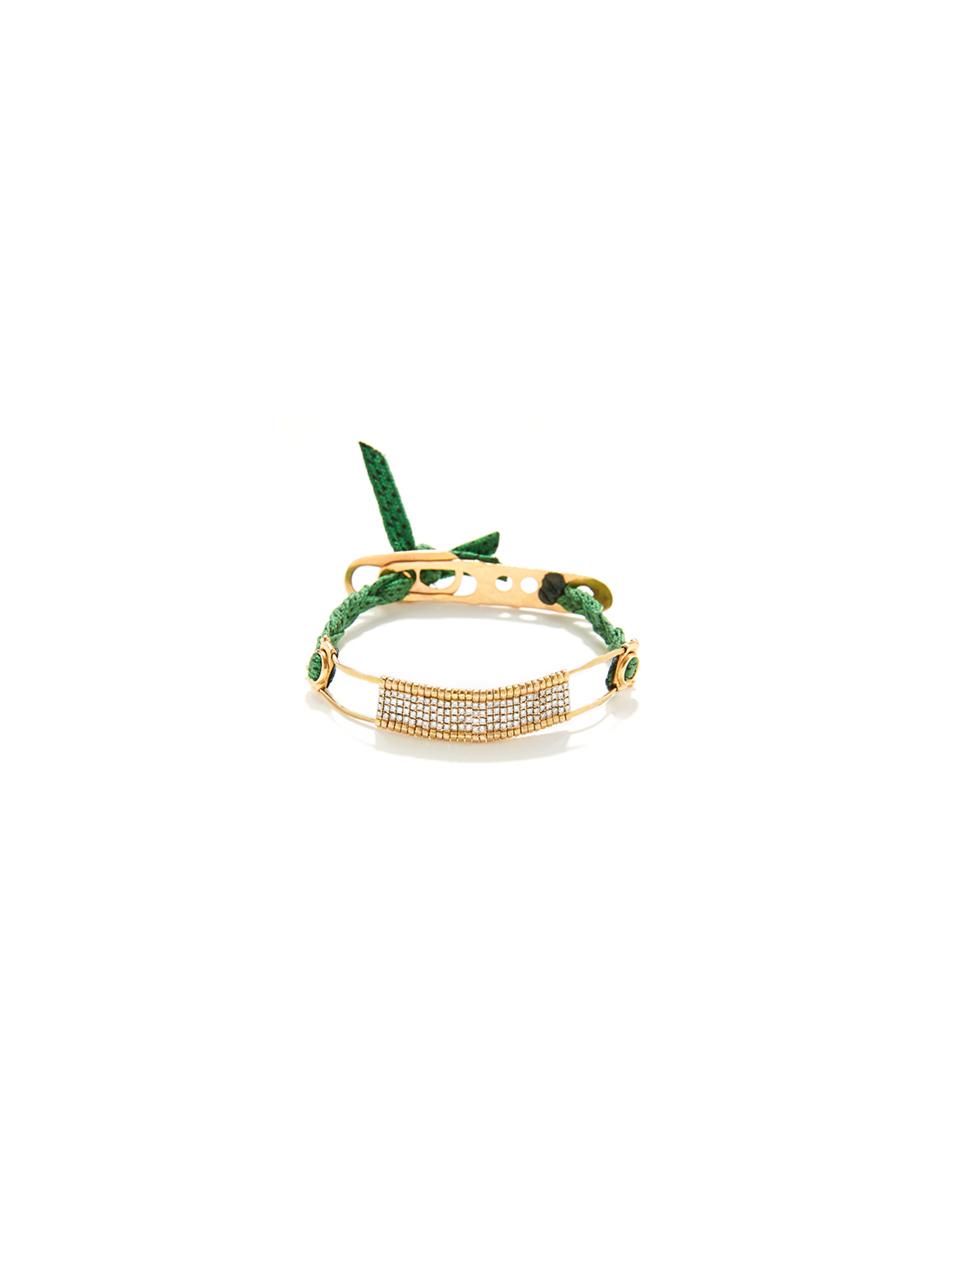 Barret bridge green bracelet